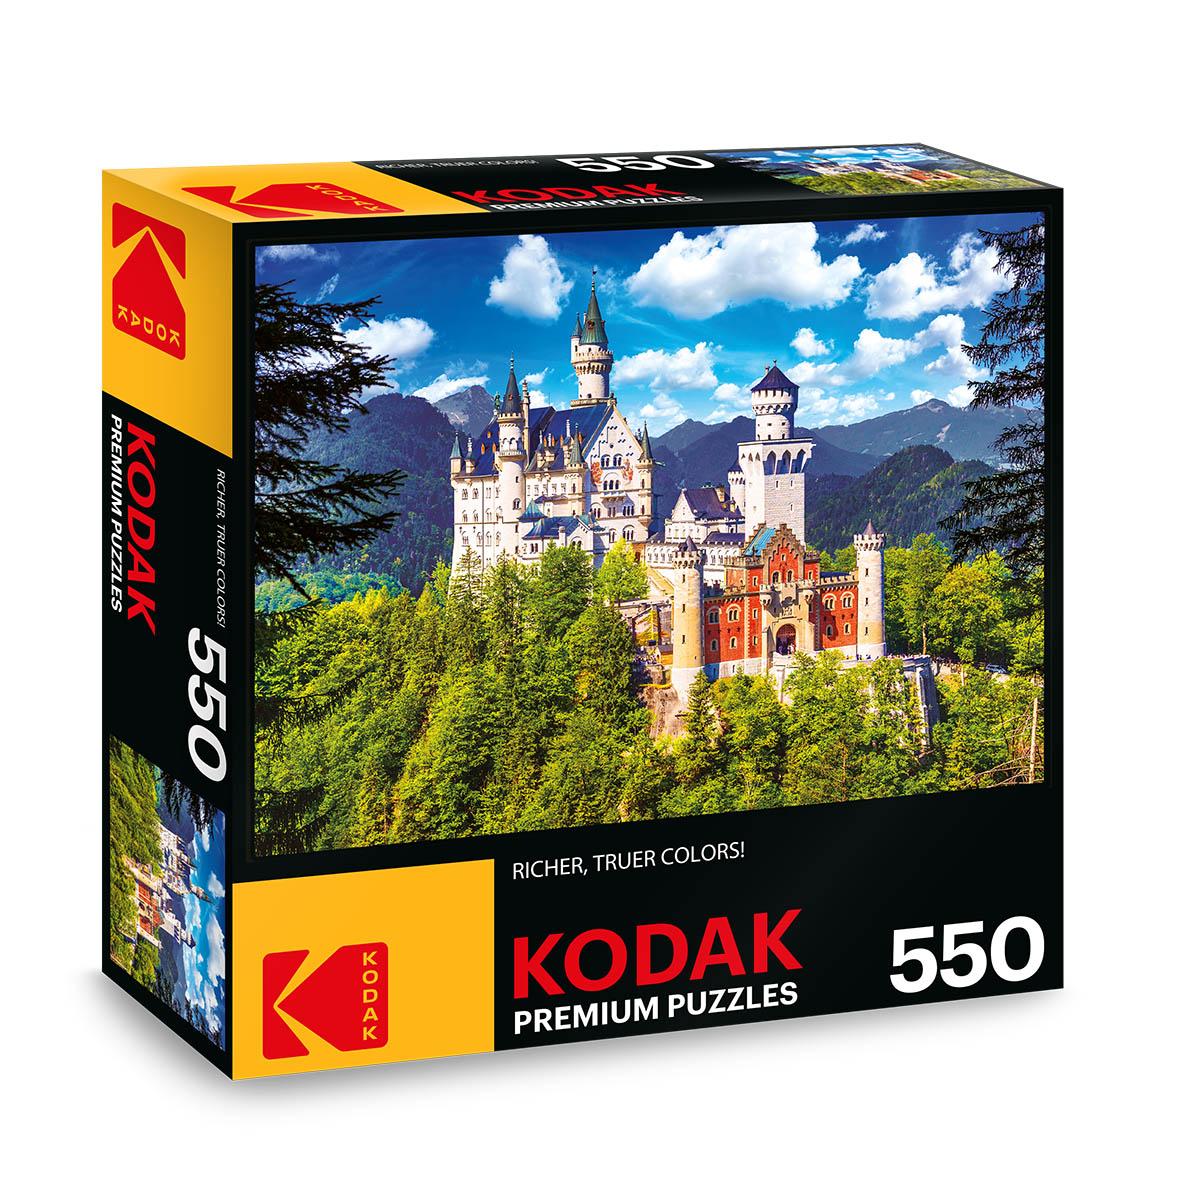 KODAK Premium Puzzles - Neuschwanstein Castle, Bavaria Castles Jigsaw Puzzle